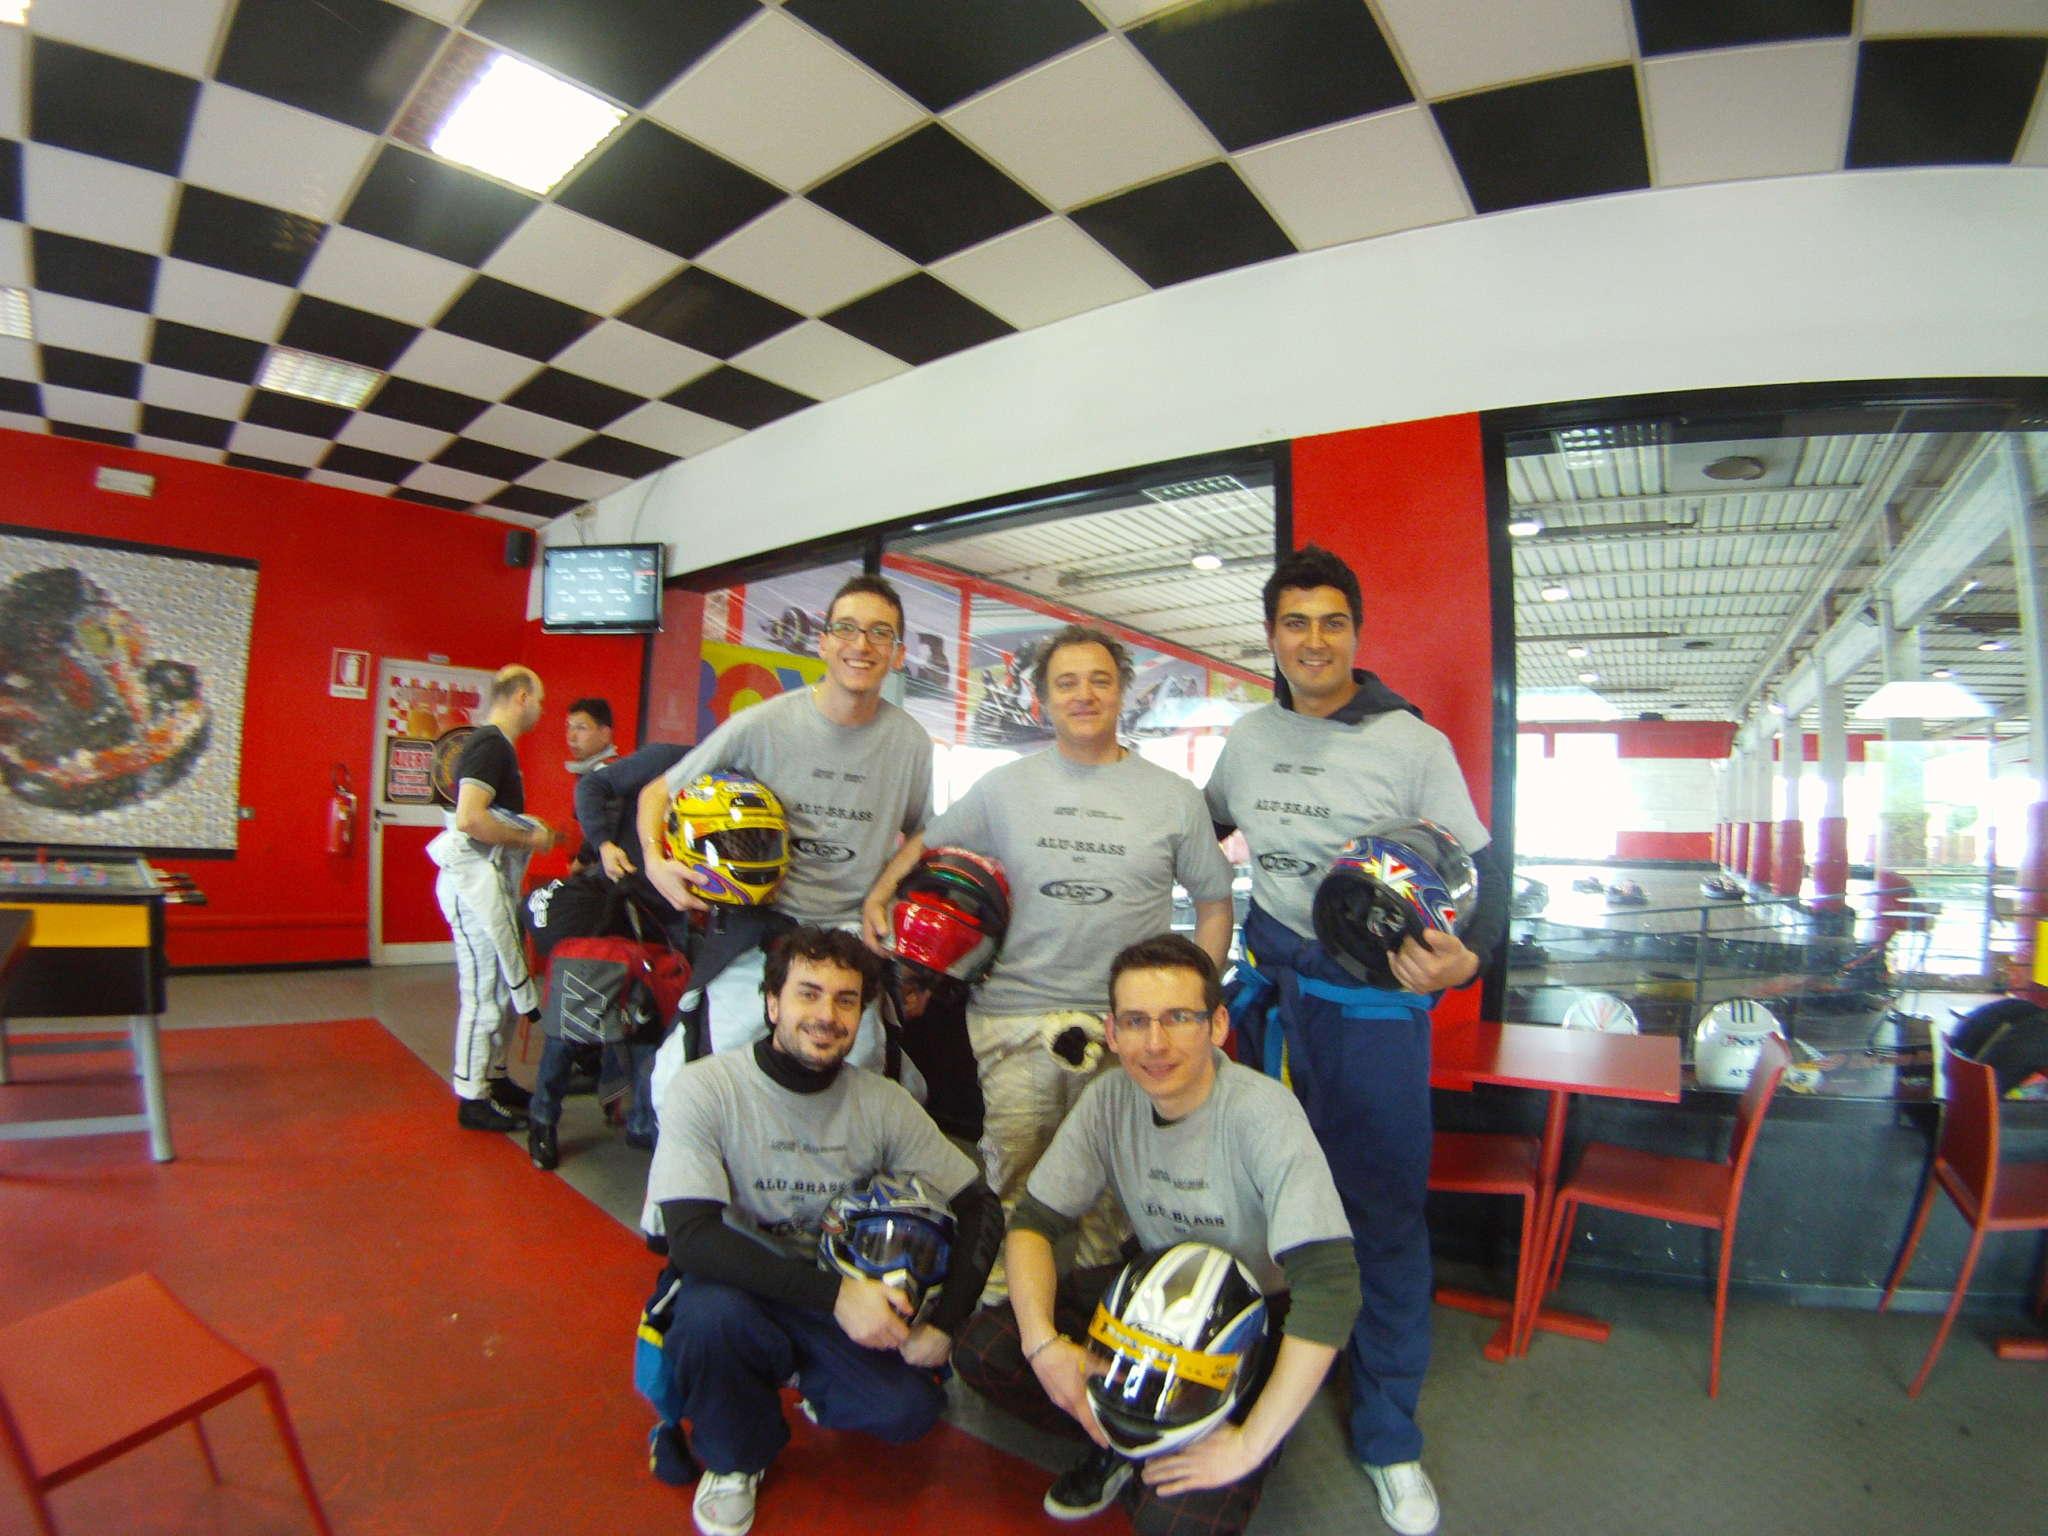 Il team alla VKI Endurance Series 2012